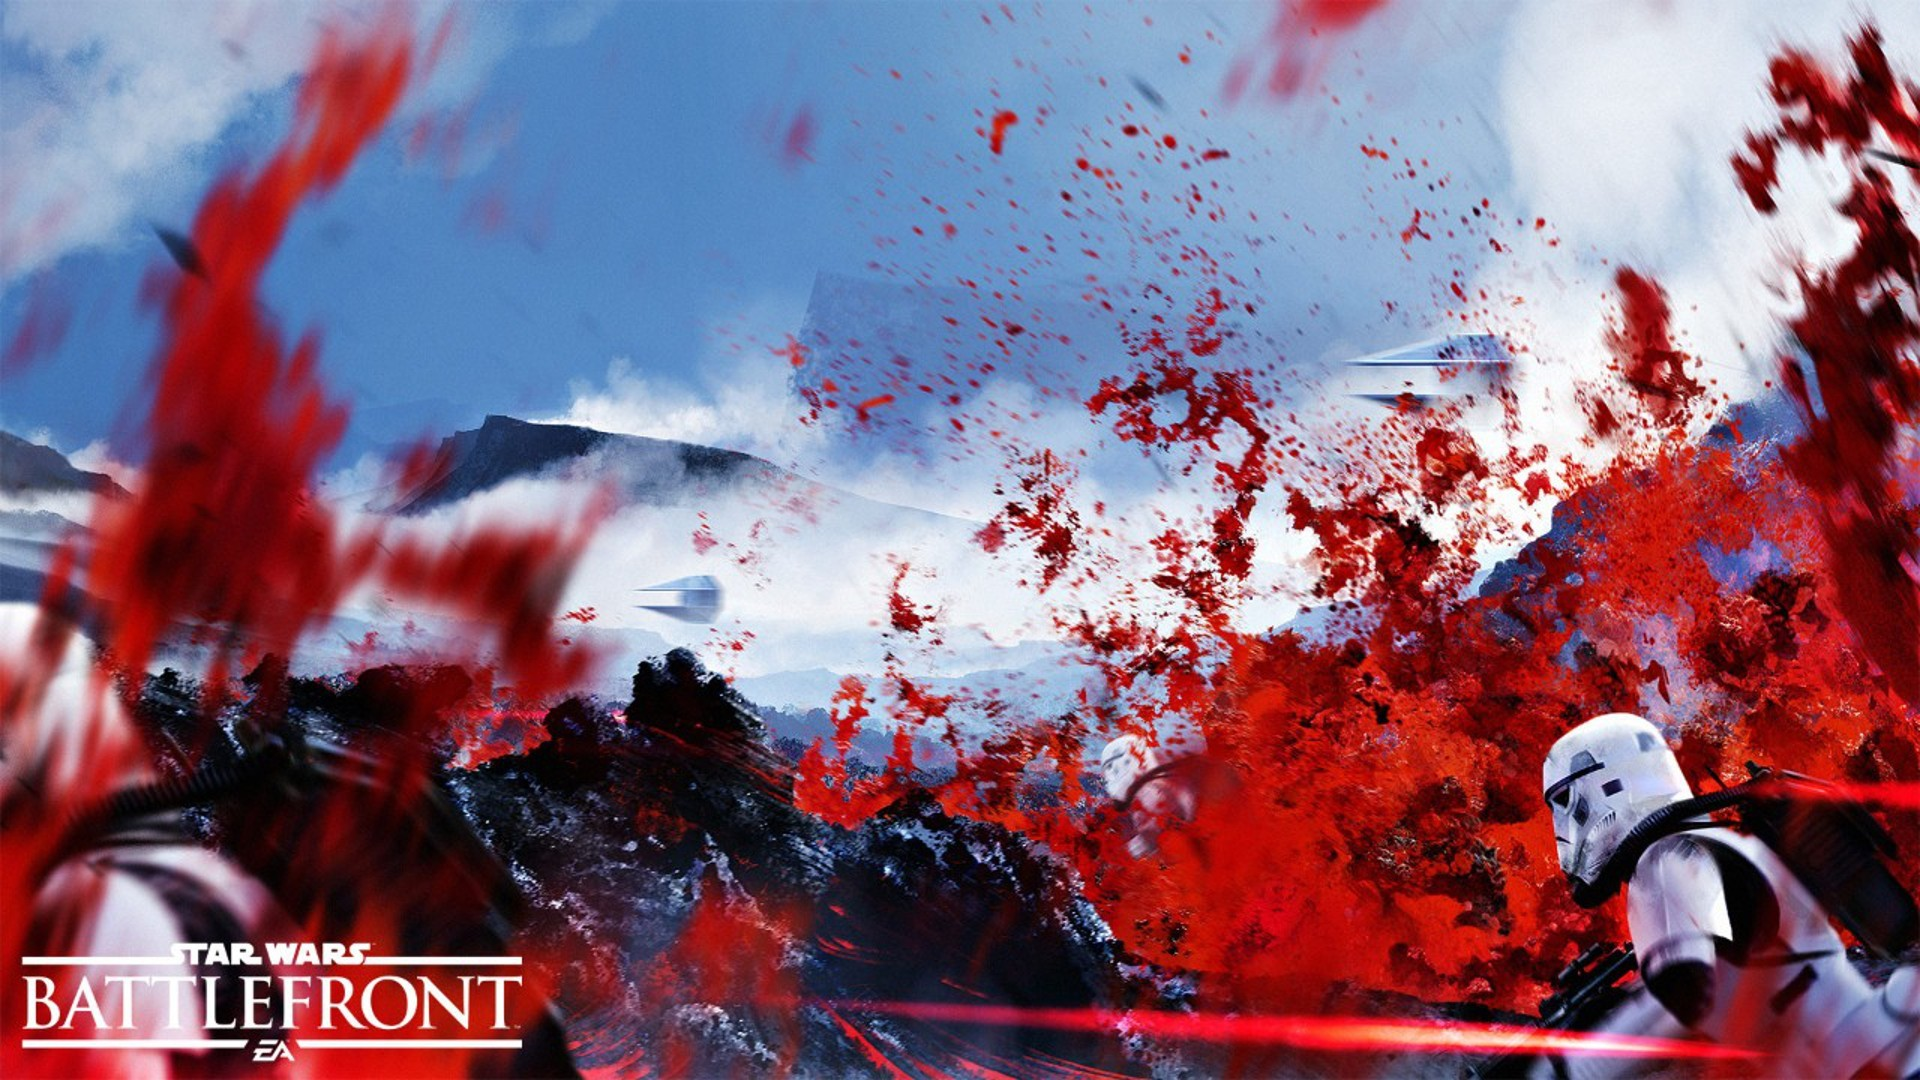 Star Wars: Battlefront, Star Wars, EA Games, Dice, Lava, TIE Fighter  Wallpapers HD / Desktop and Mobile Backgrounds